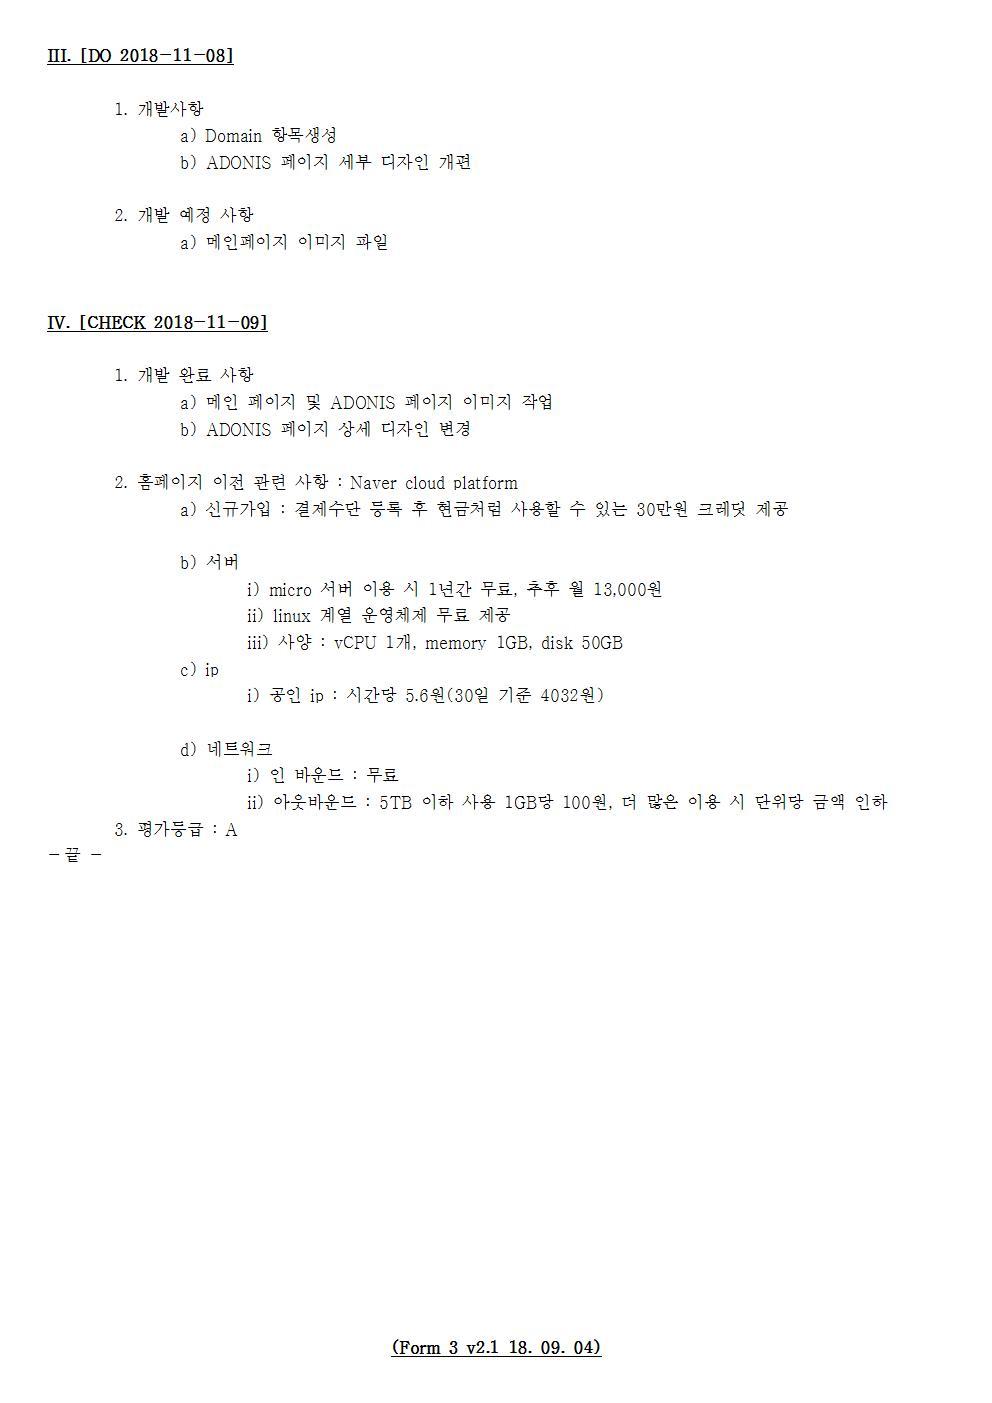 D-[18-047-BZ-07]-[BZEN HP v3.0]-[2018-11-09][HH]003.jpg